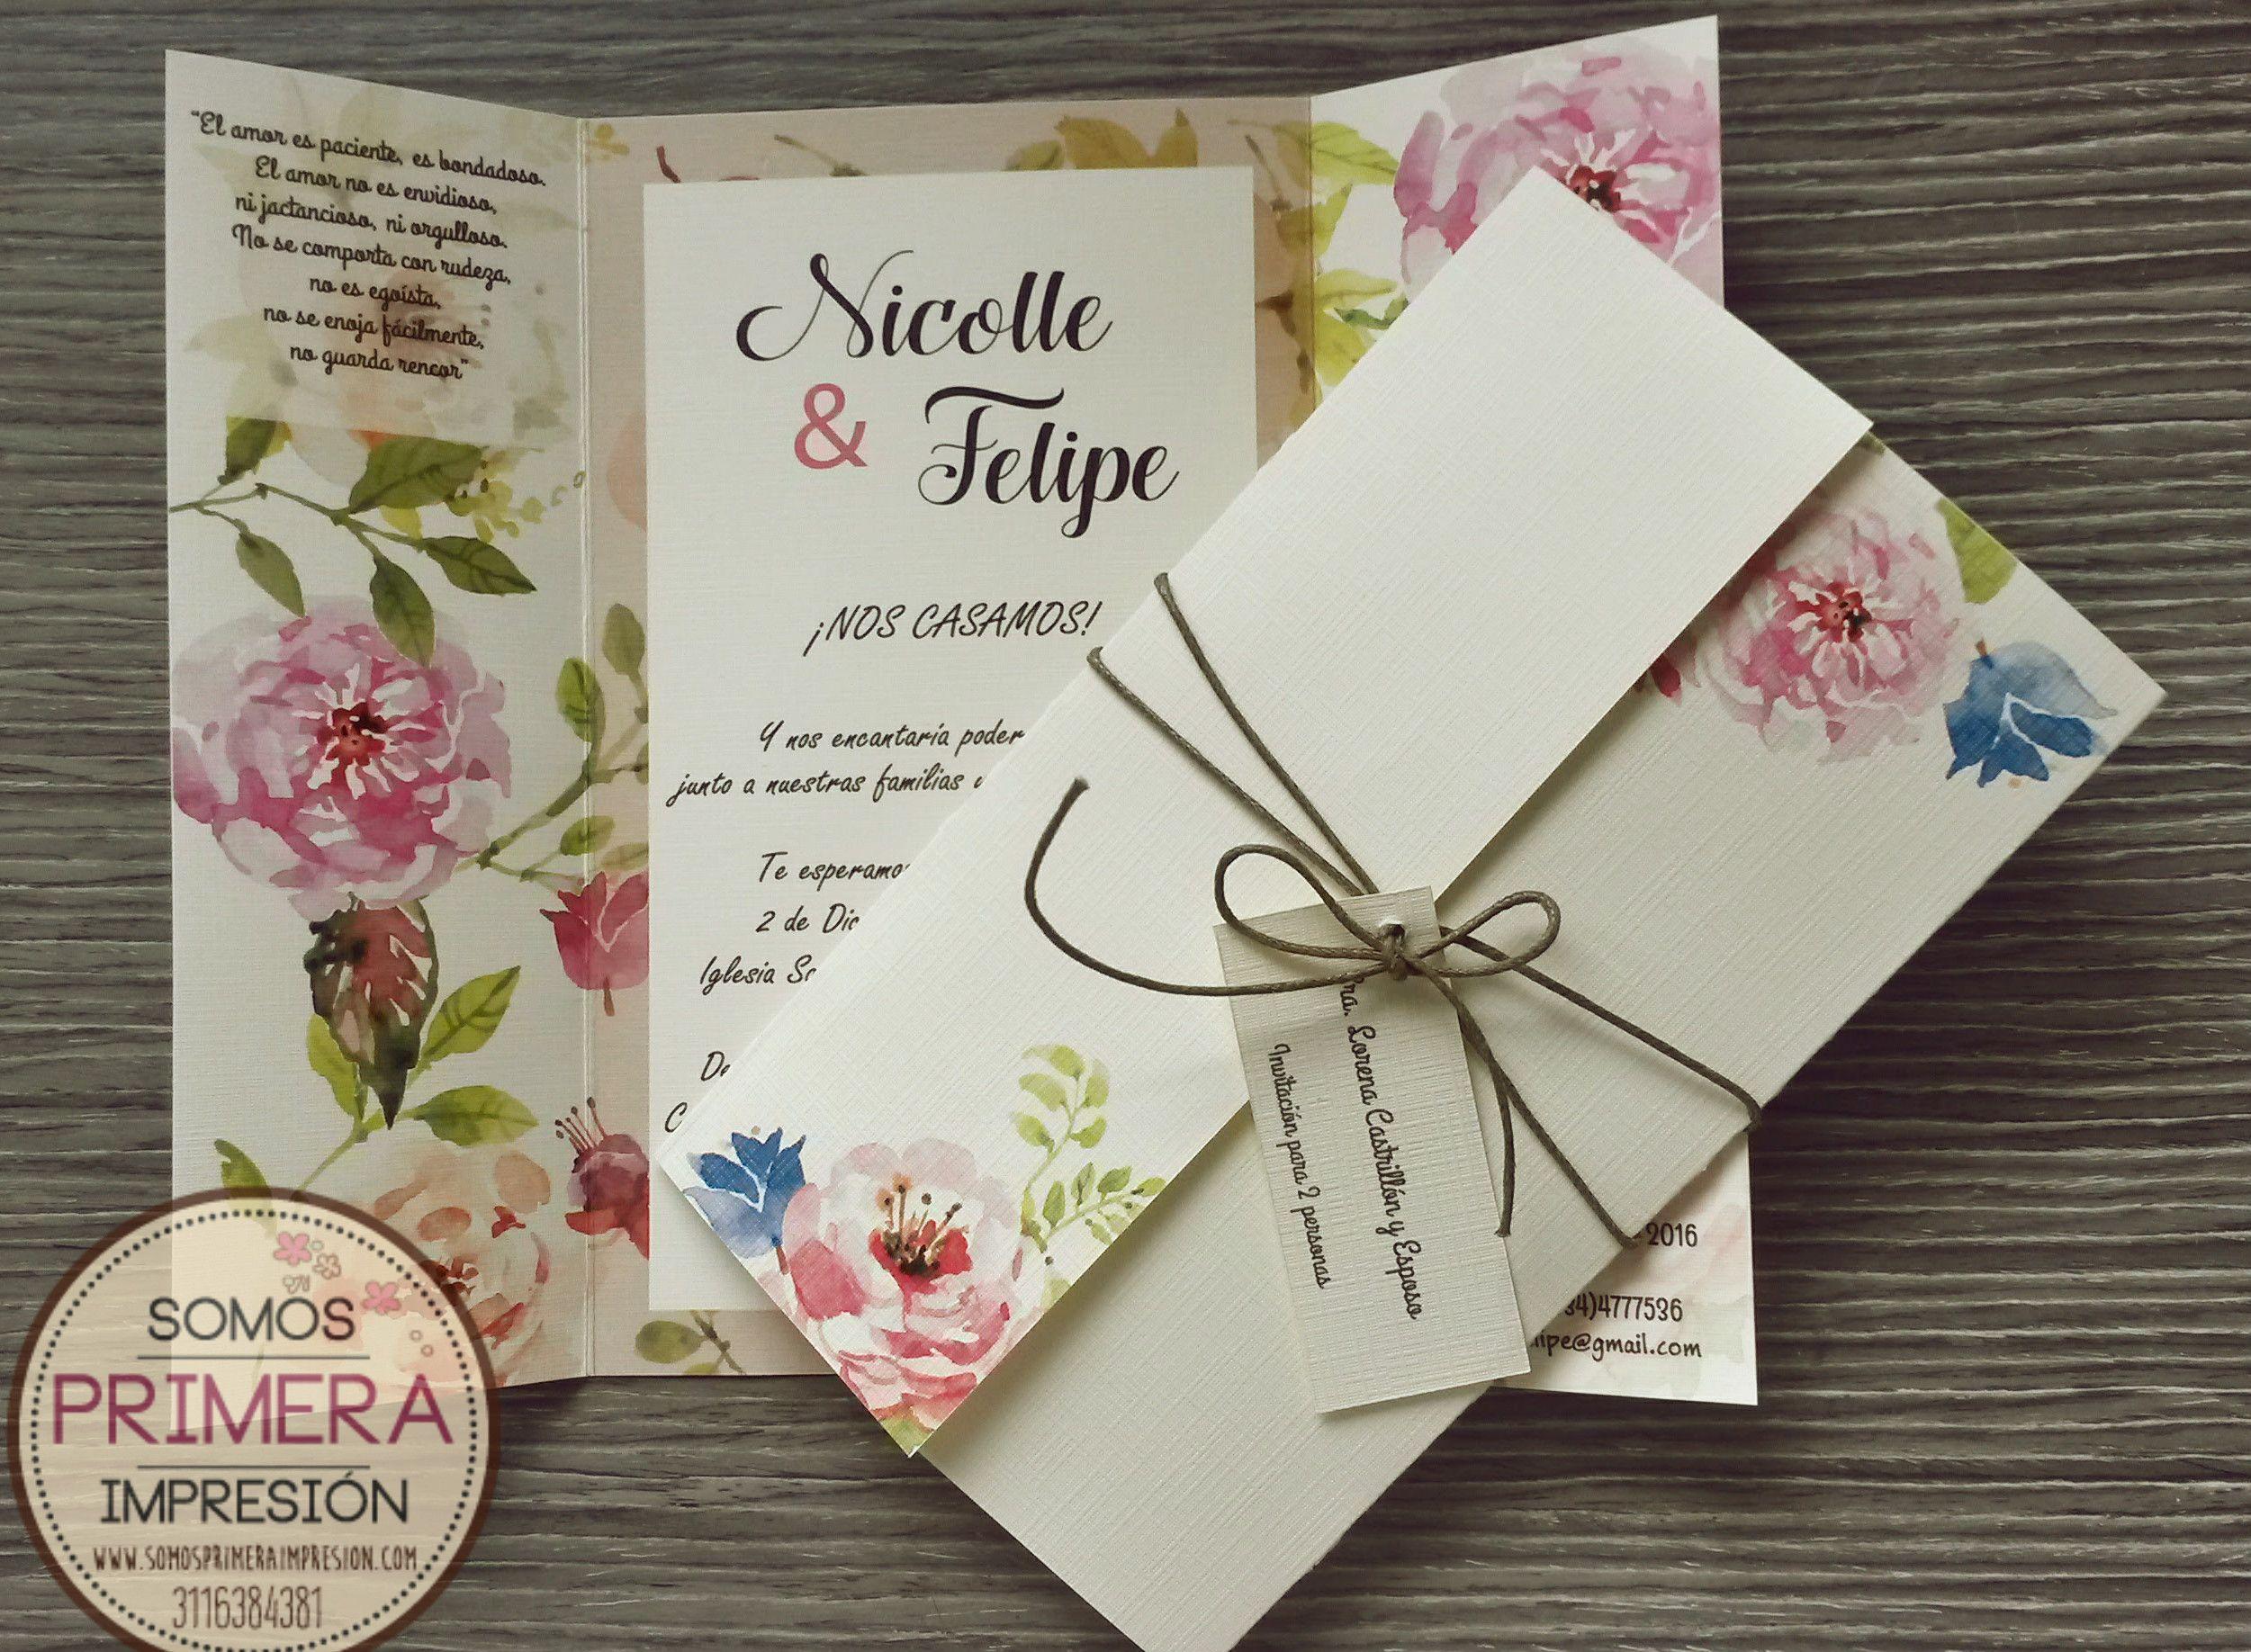 Tarjeta de invitaci n para boda dise o floral - Disenos tarjetas de boda ...